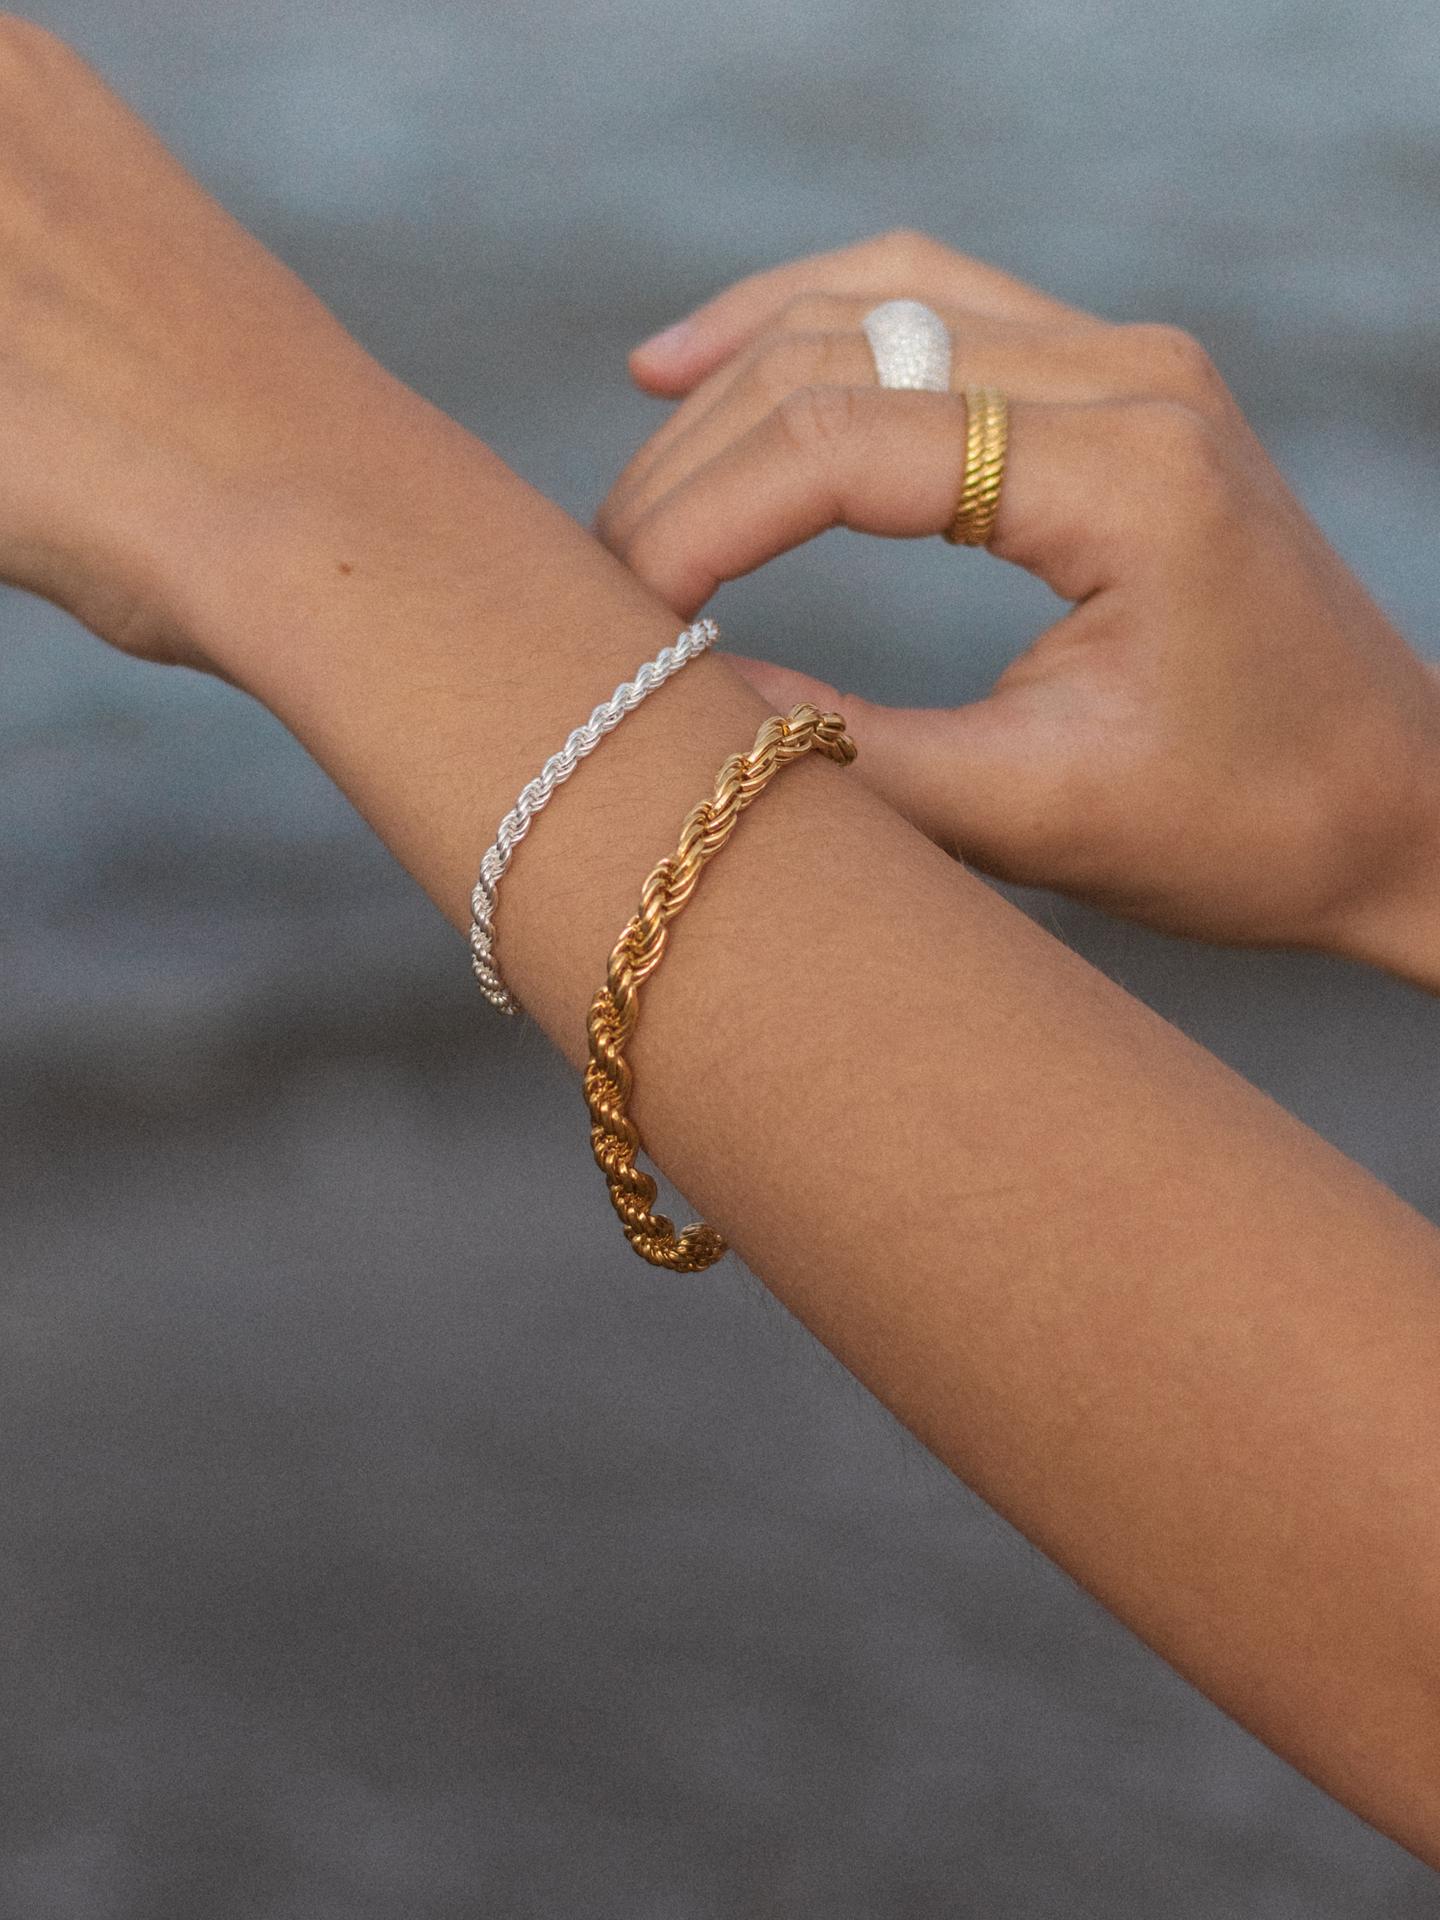 Big Corda Chain Bracelet